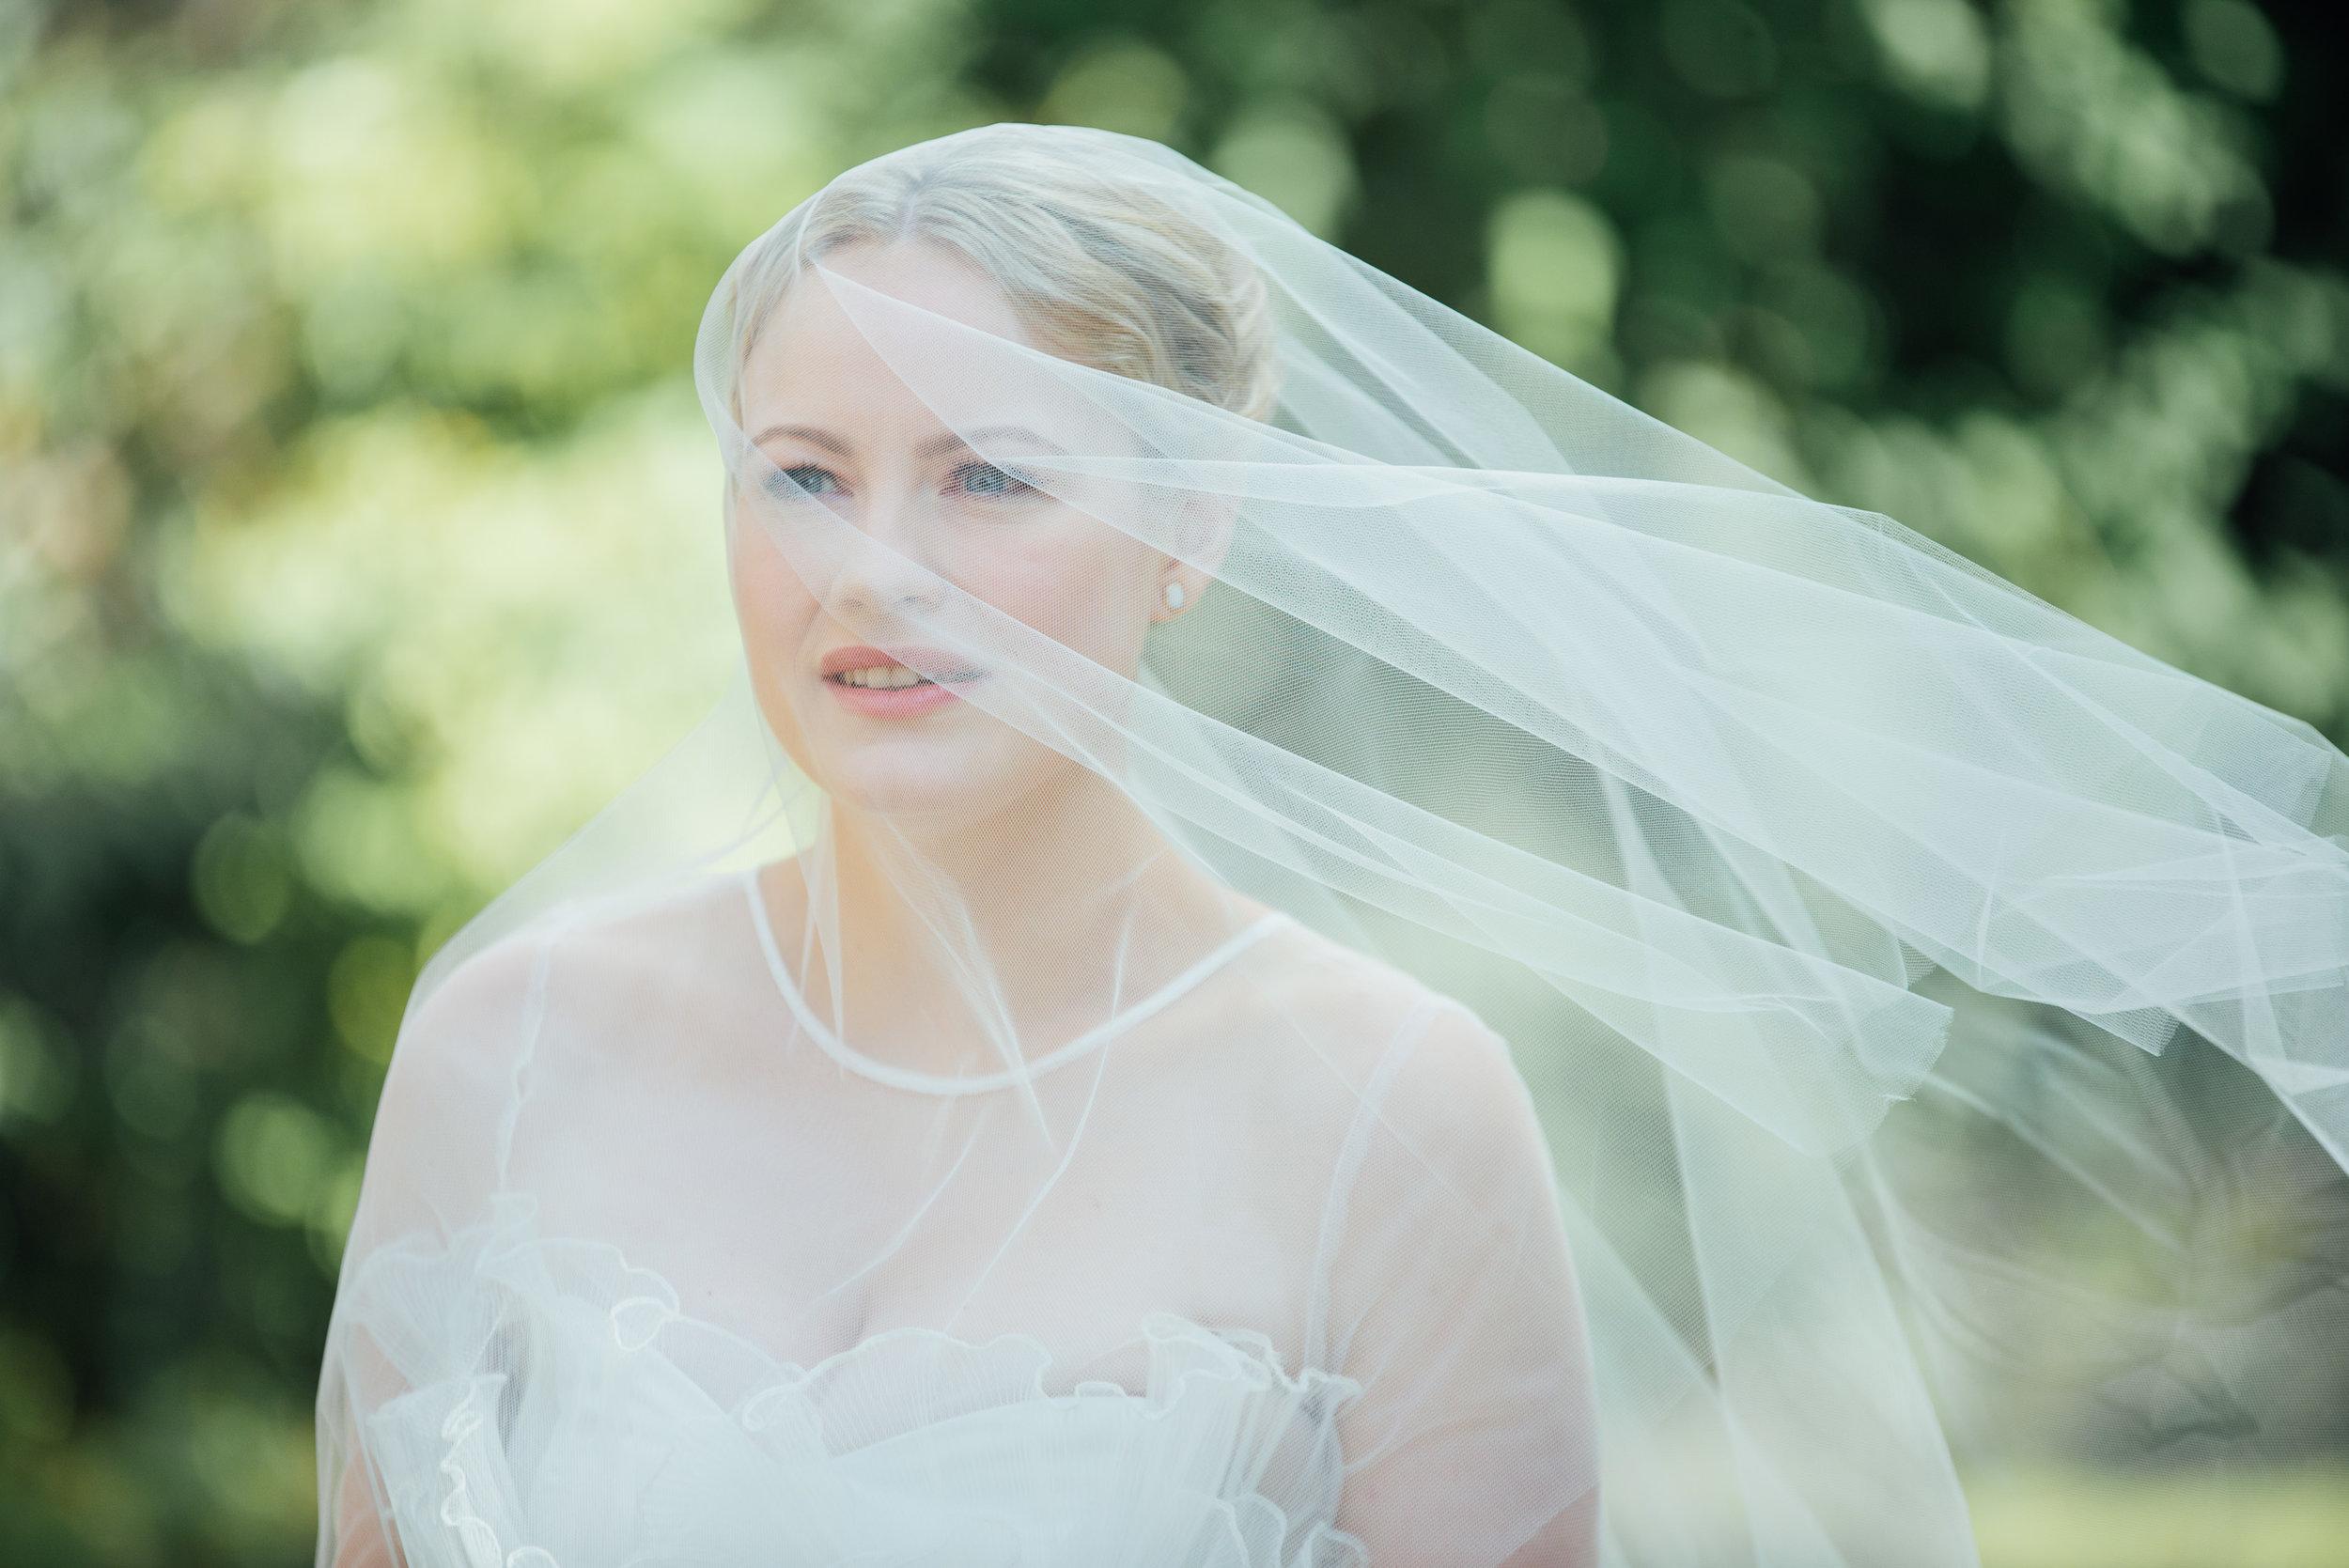 cleland-studios-wedding-photography-29.jpg